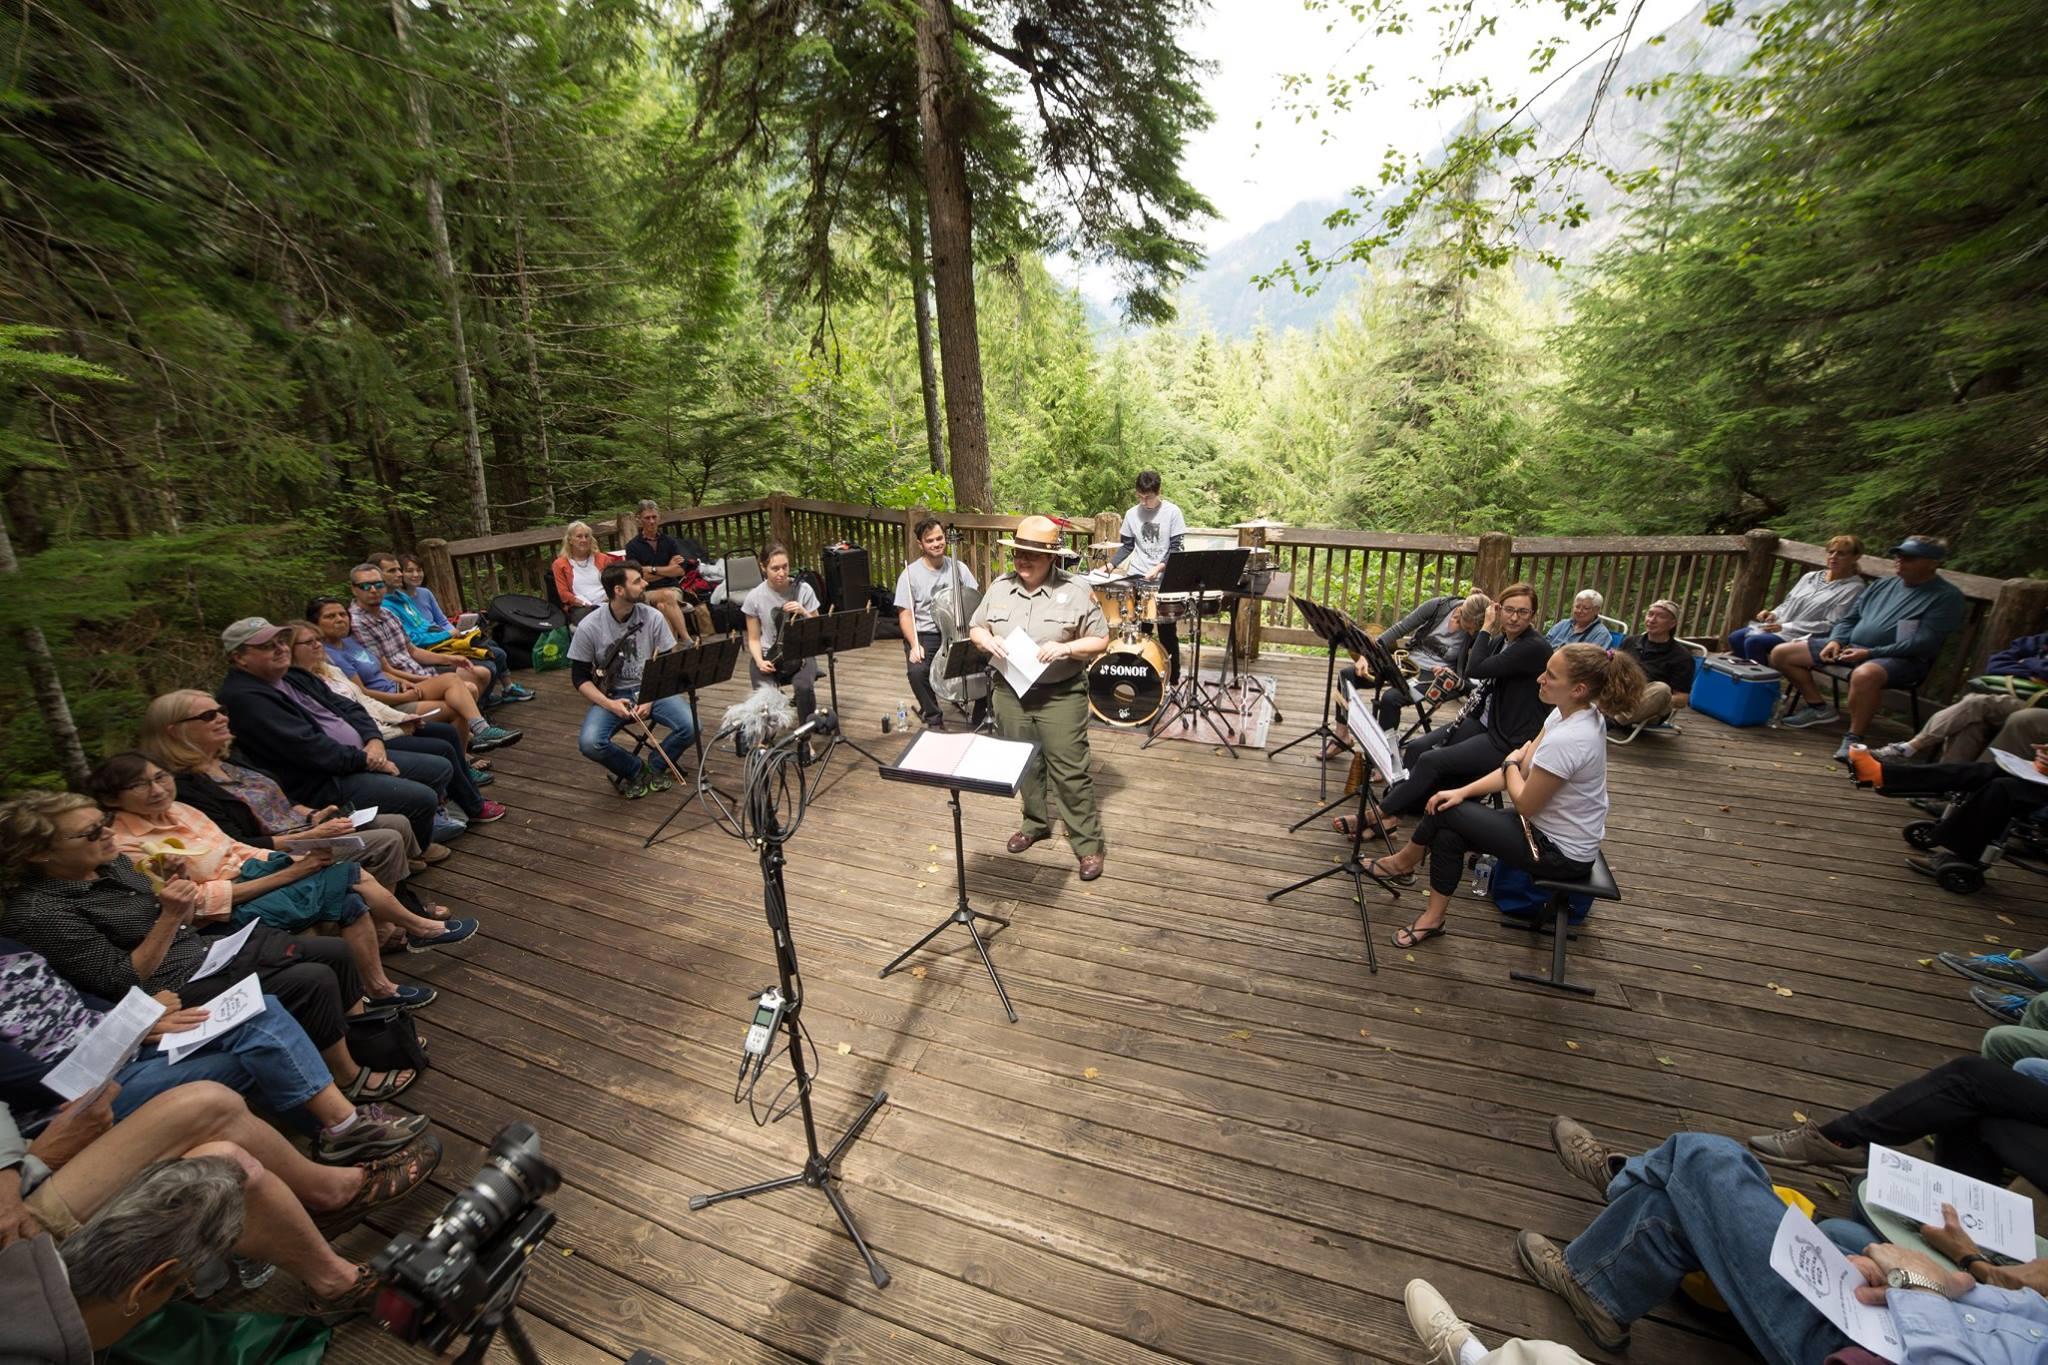 American Wild Ensemble.Newhalem, WA.Image by Geoff Sheil.